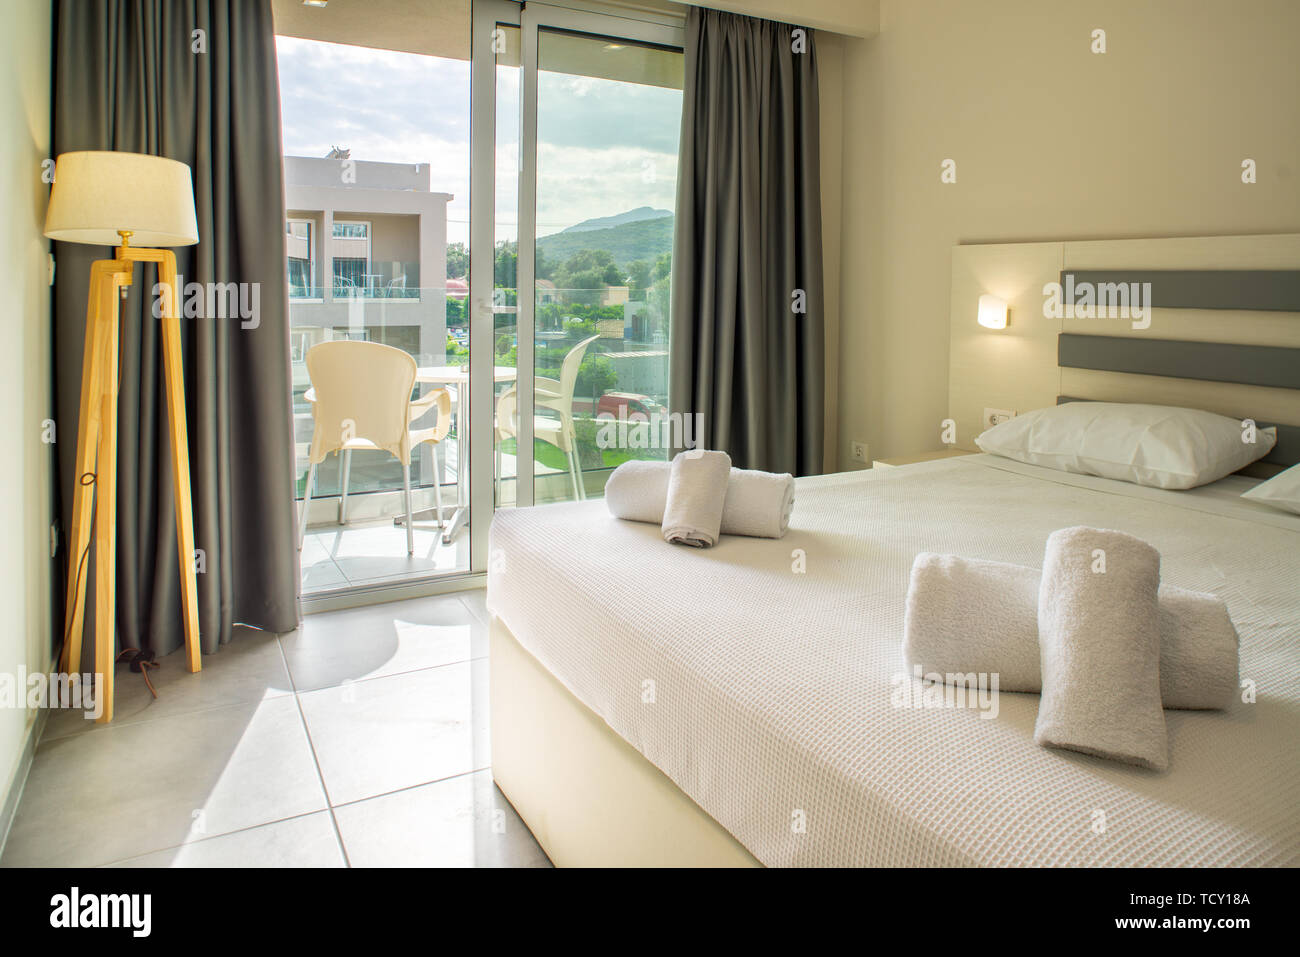 Luxury Modern Hotel Room Stock Photo 248914746 Alamy